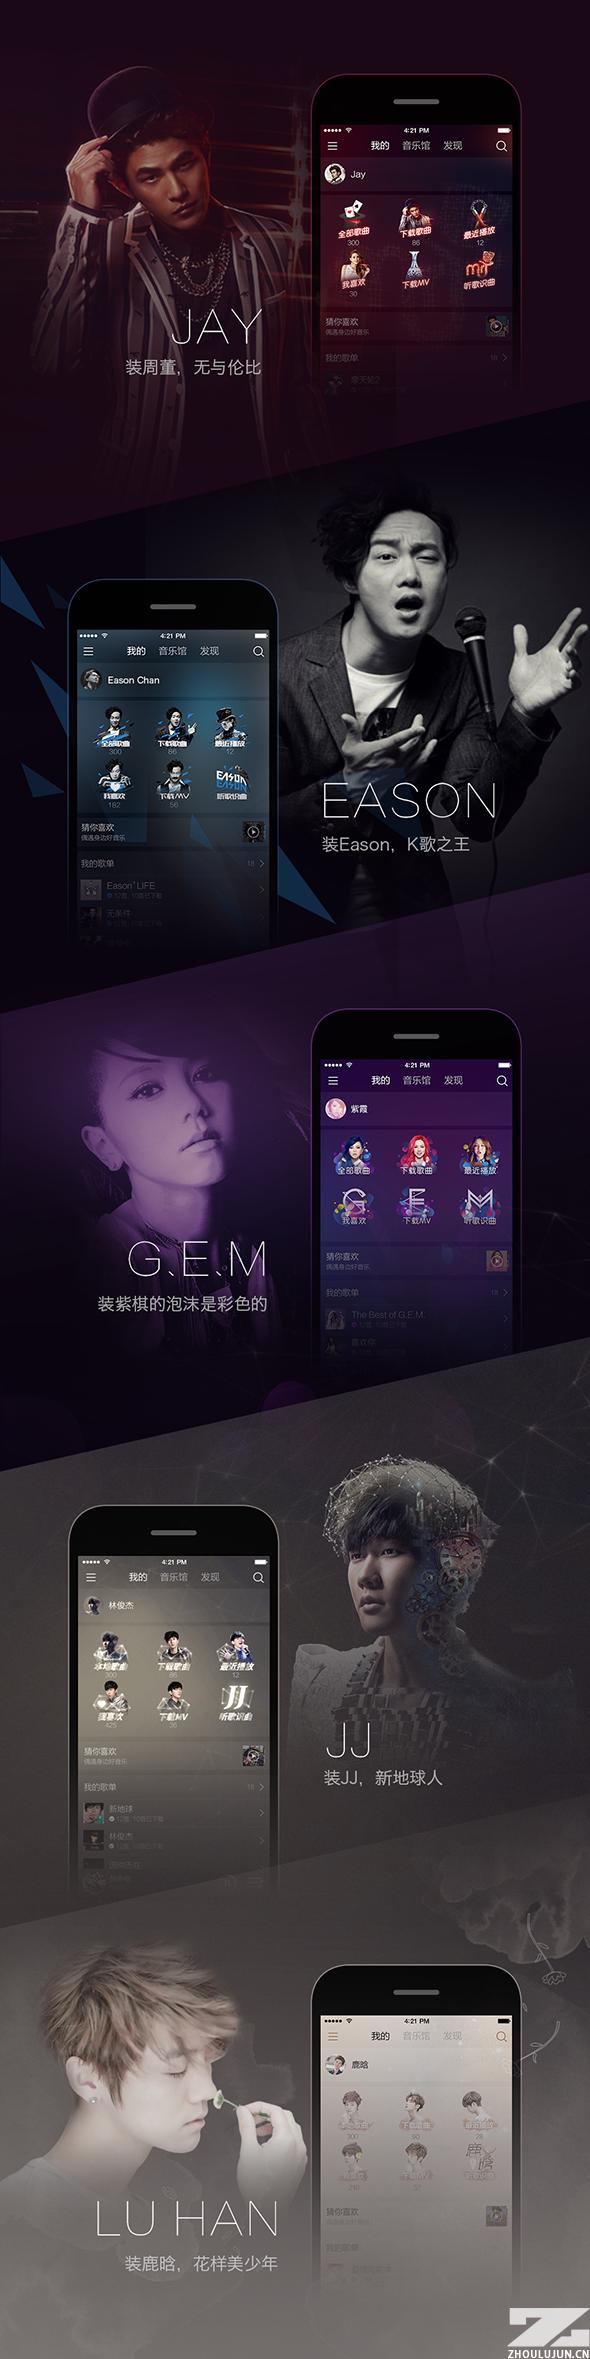 QQ音乐业界首创「大咖装」